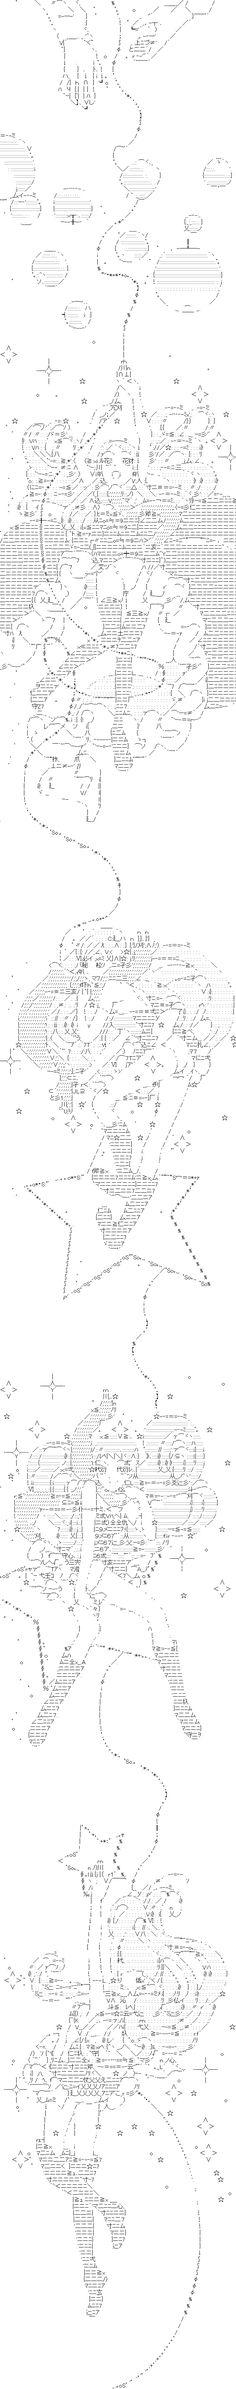 One Line Ascii Art New Year : 出たとこ勝@負ログ 文字だけの世界 顔文字とアスキーアート aa pinterest アスキーアート